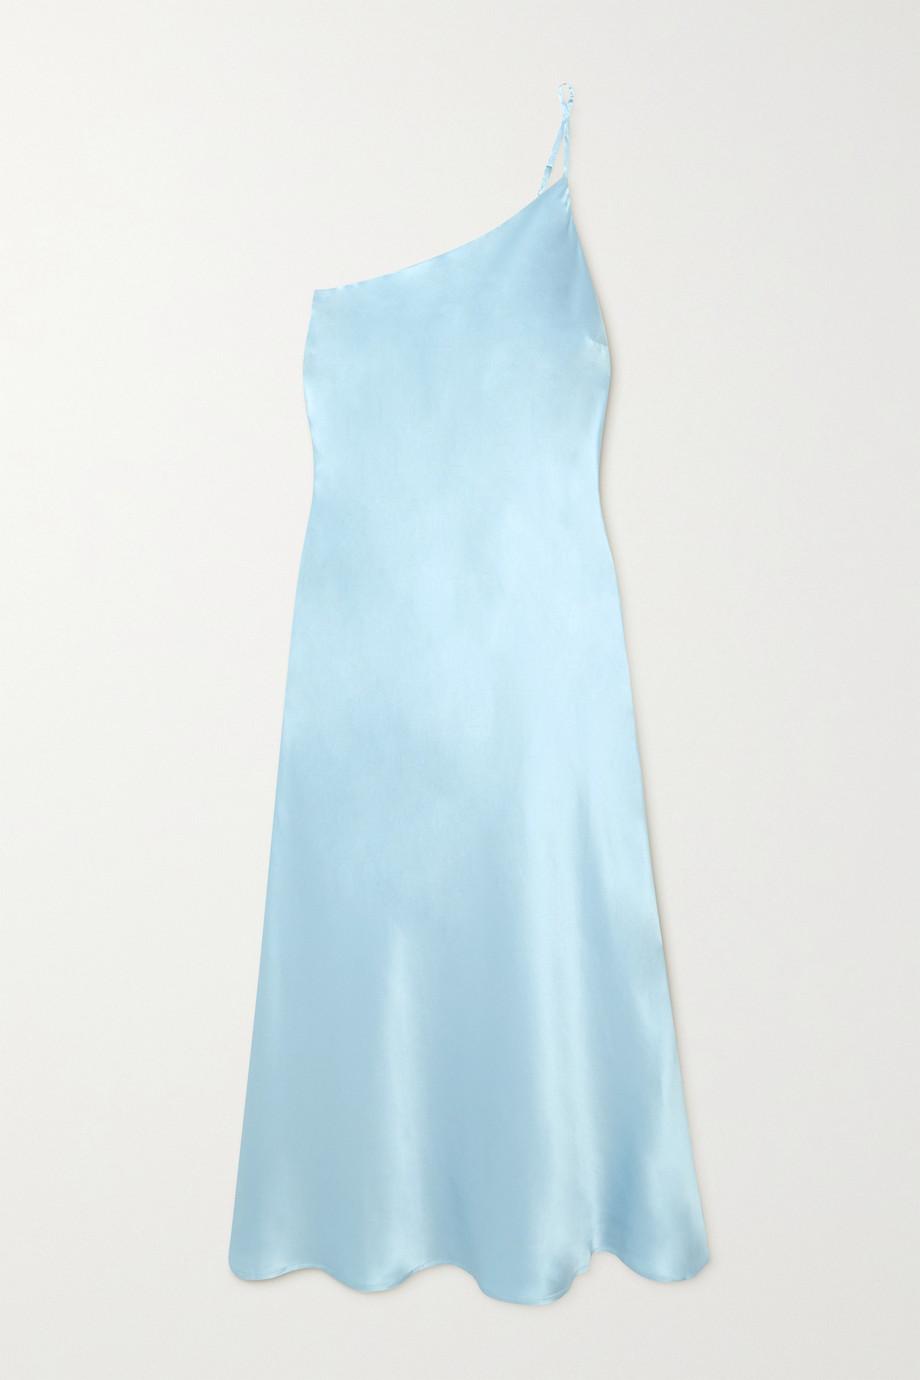 Maison Essentiele Lucile one-shoulder silk-satin chemise